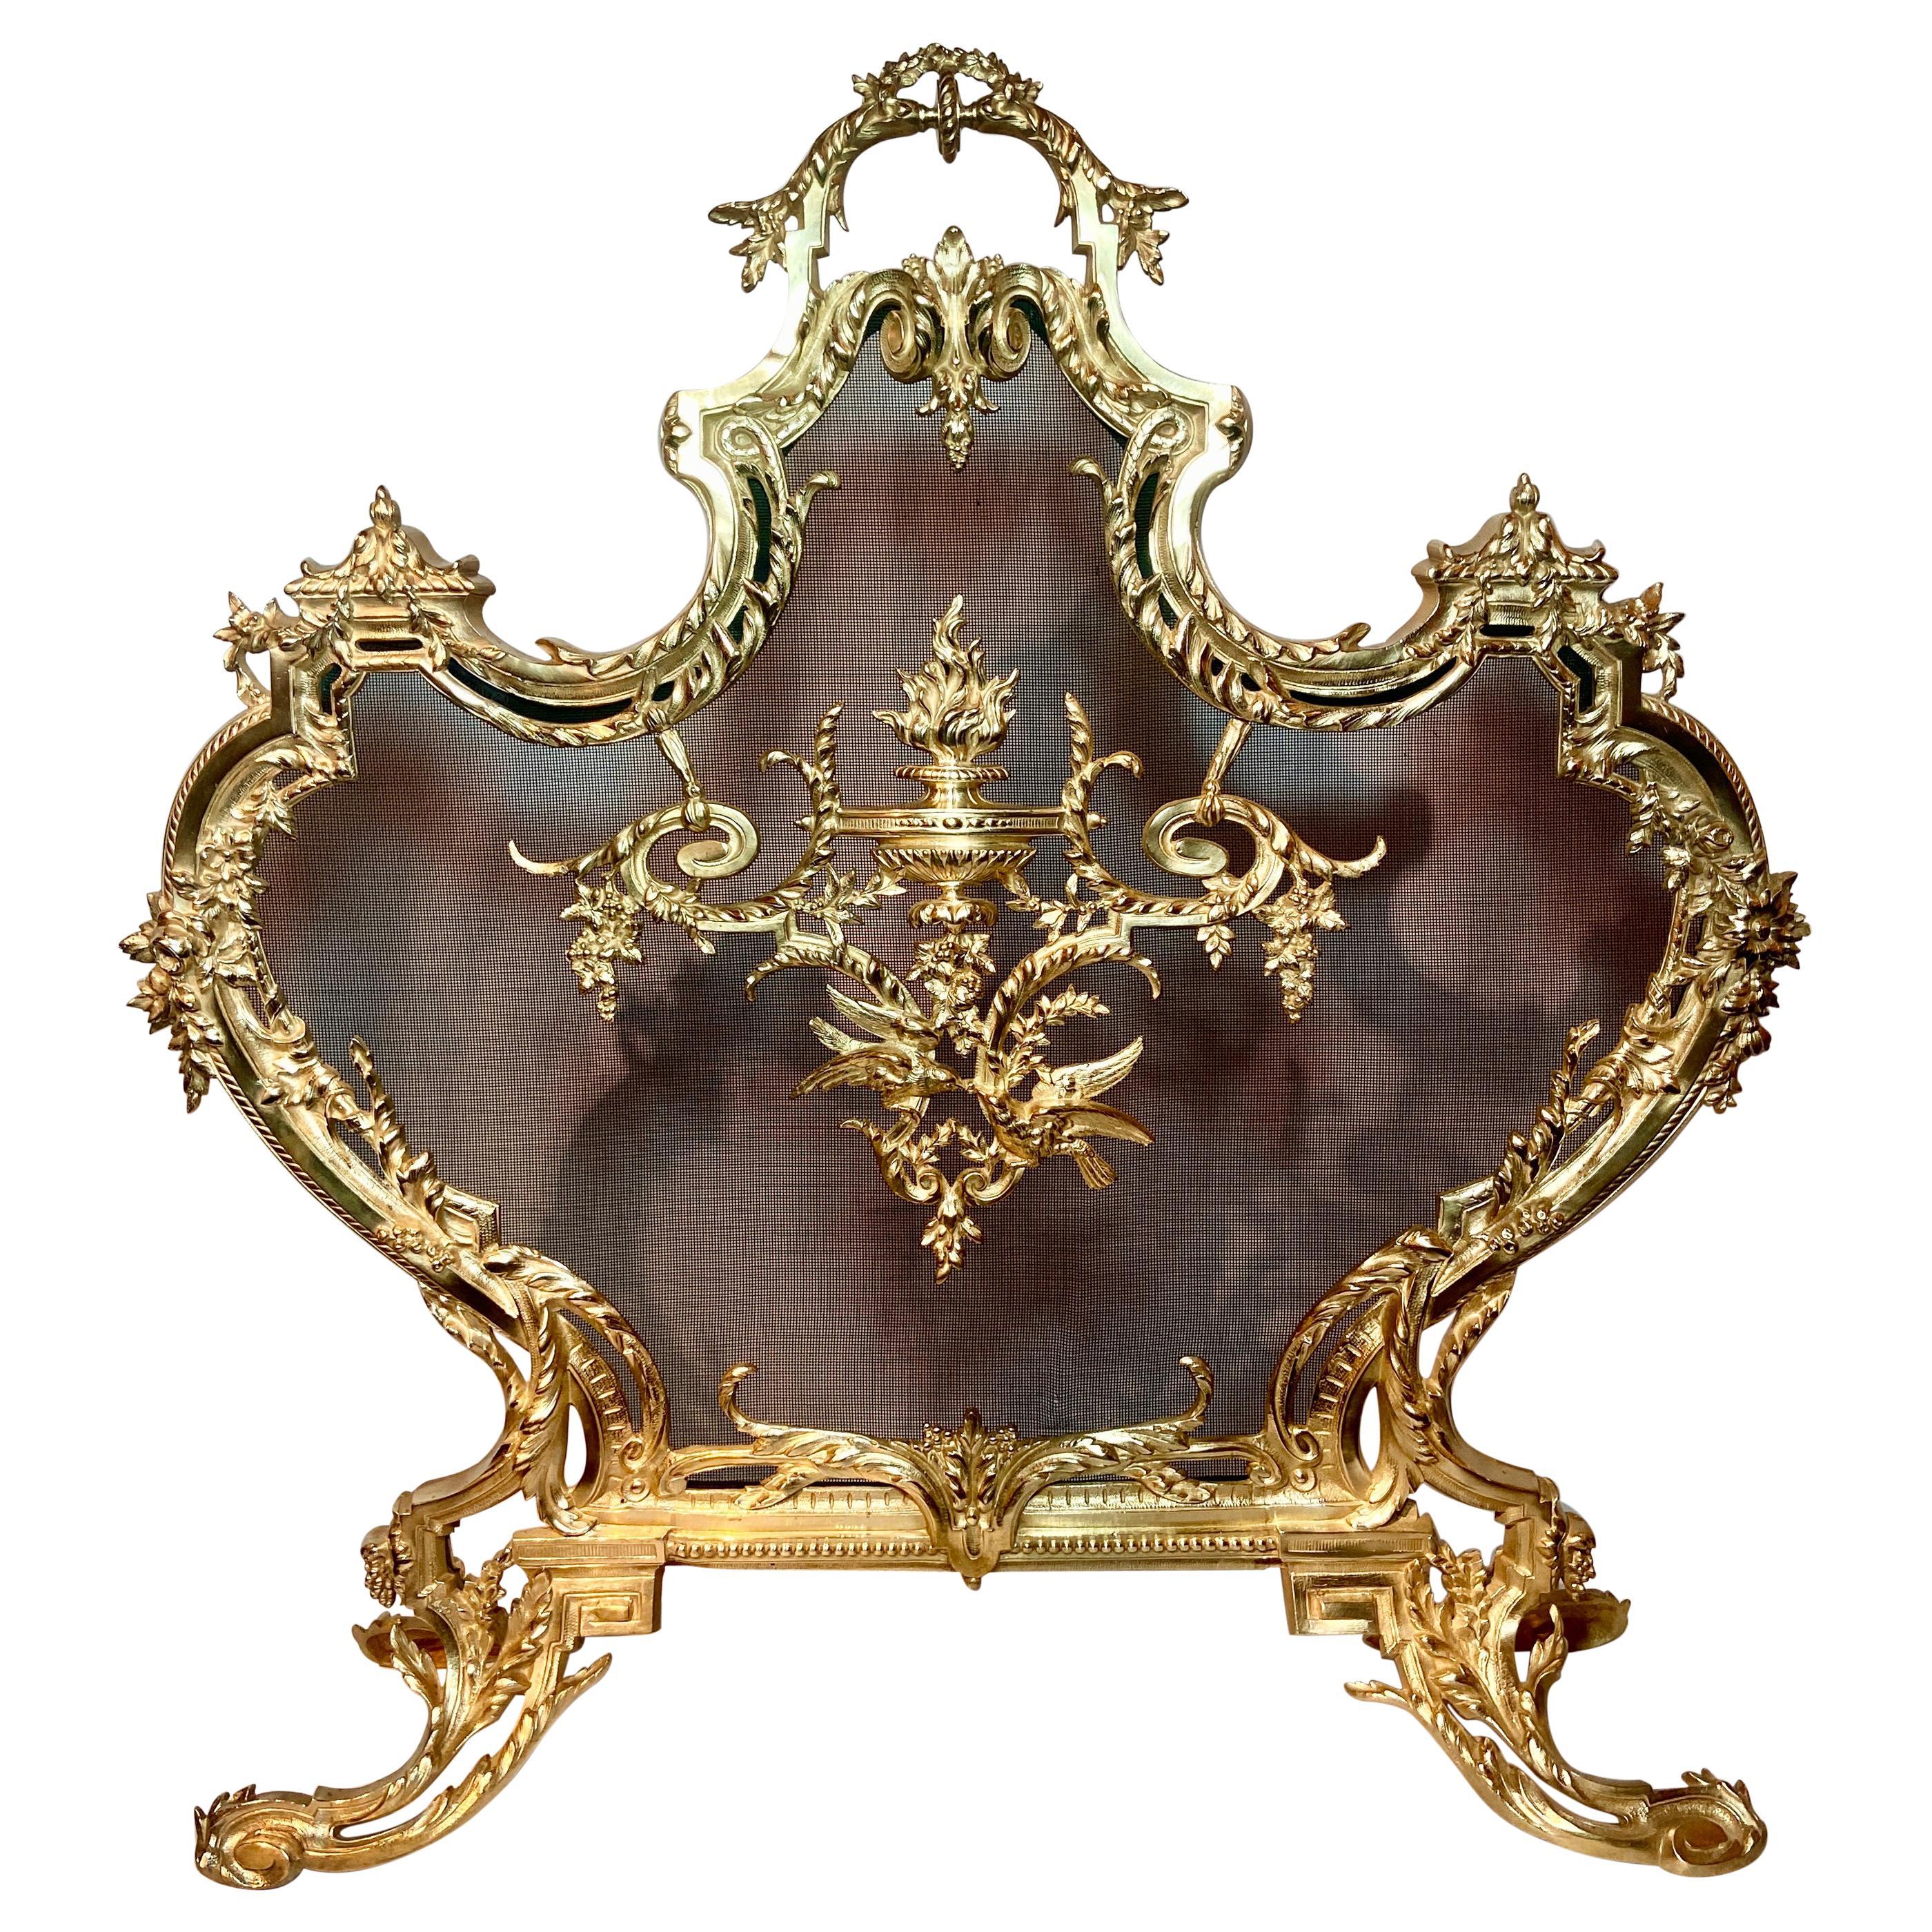 Antique French Louis XV Gold Bronze Fire Screen, Circa 1880.